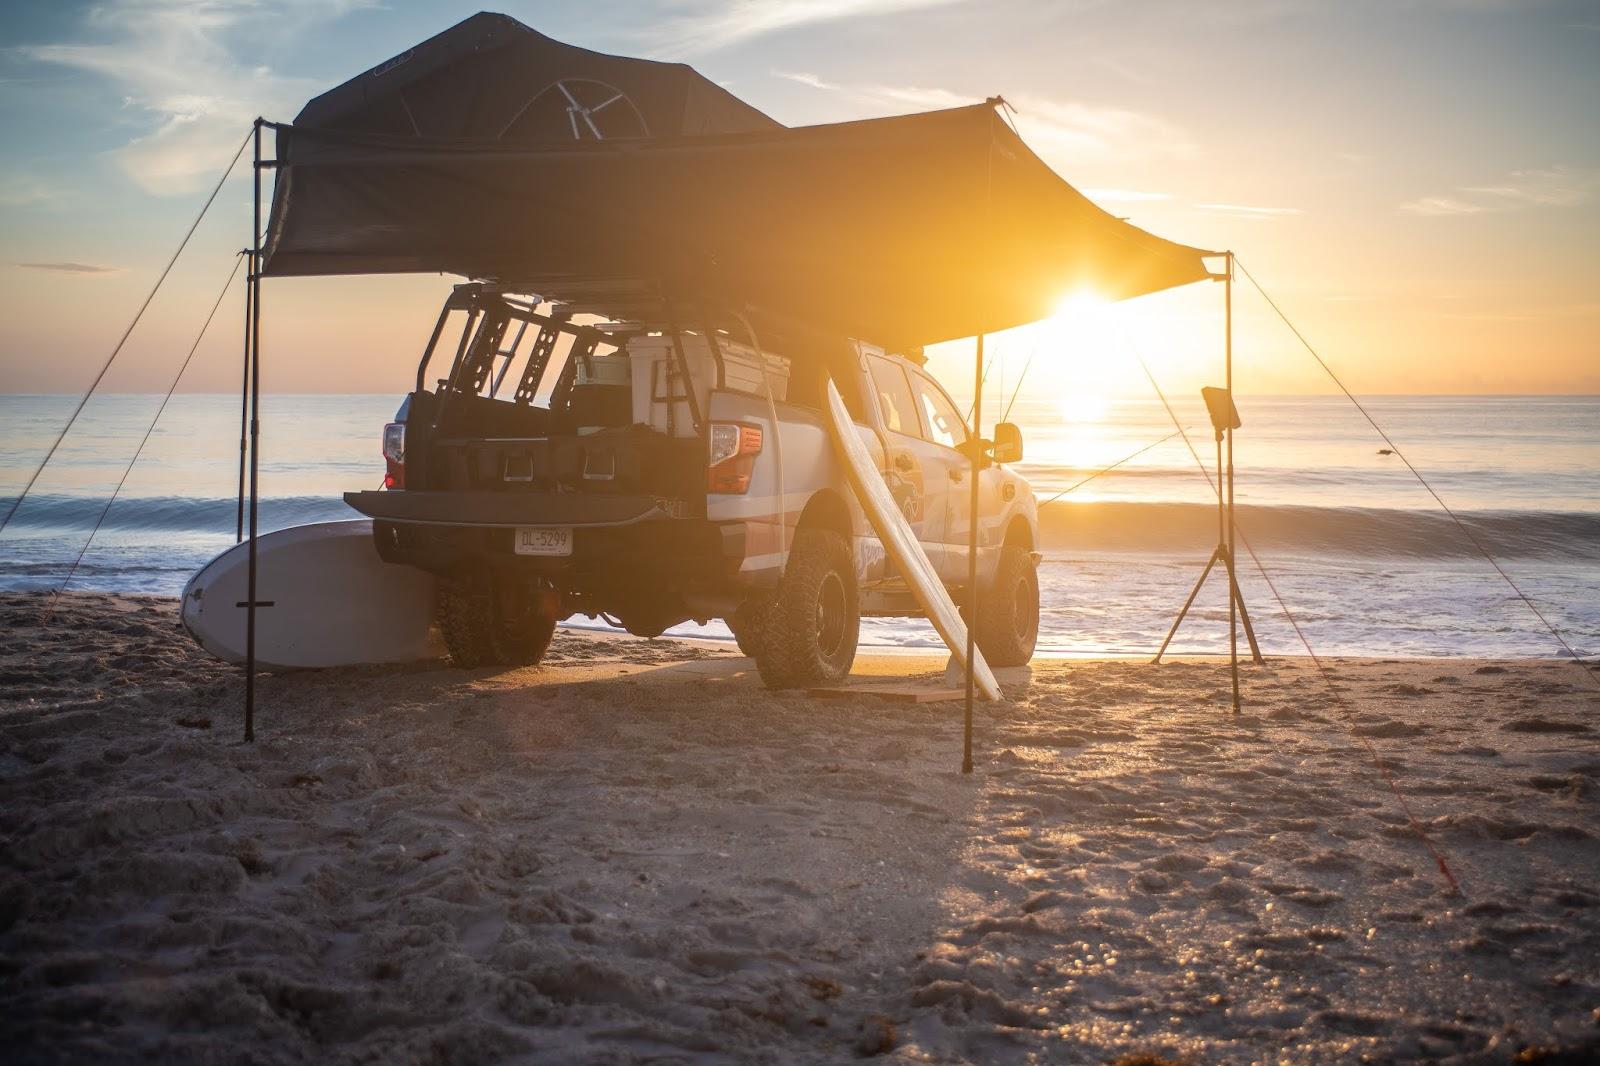 2018 Nissan Titan Surfcamp Dro4cars